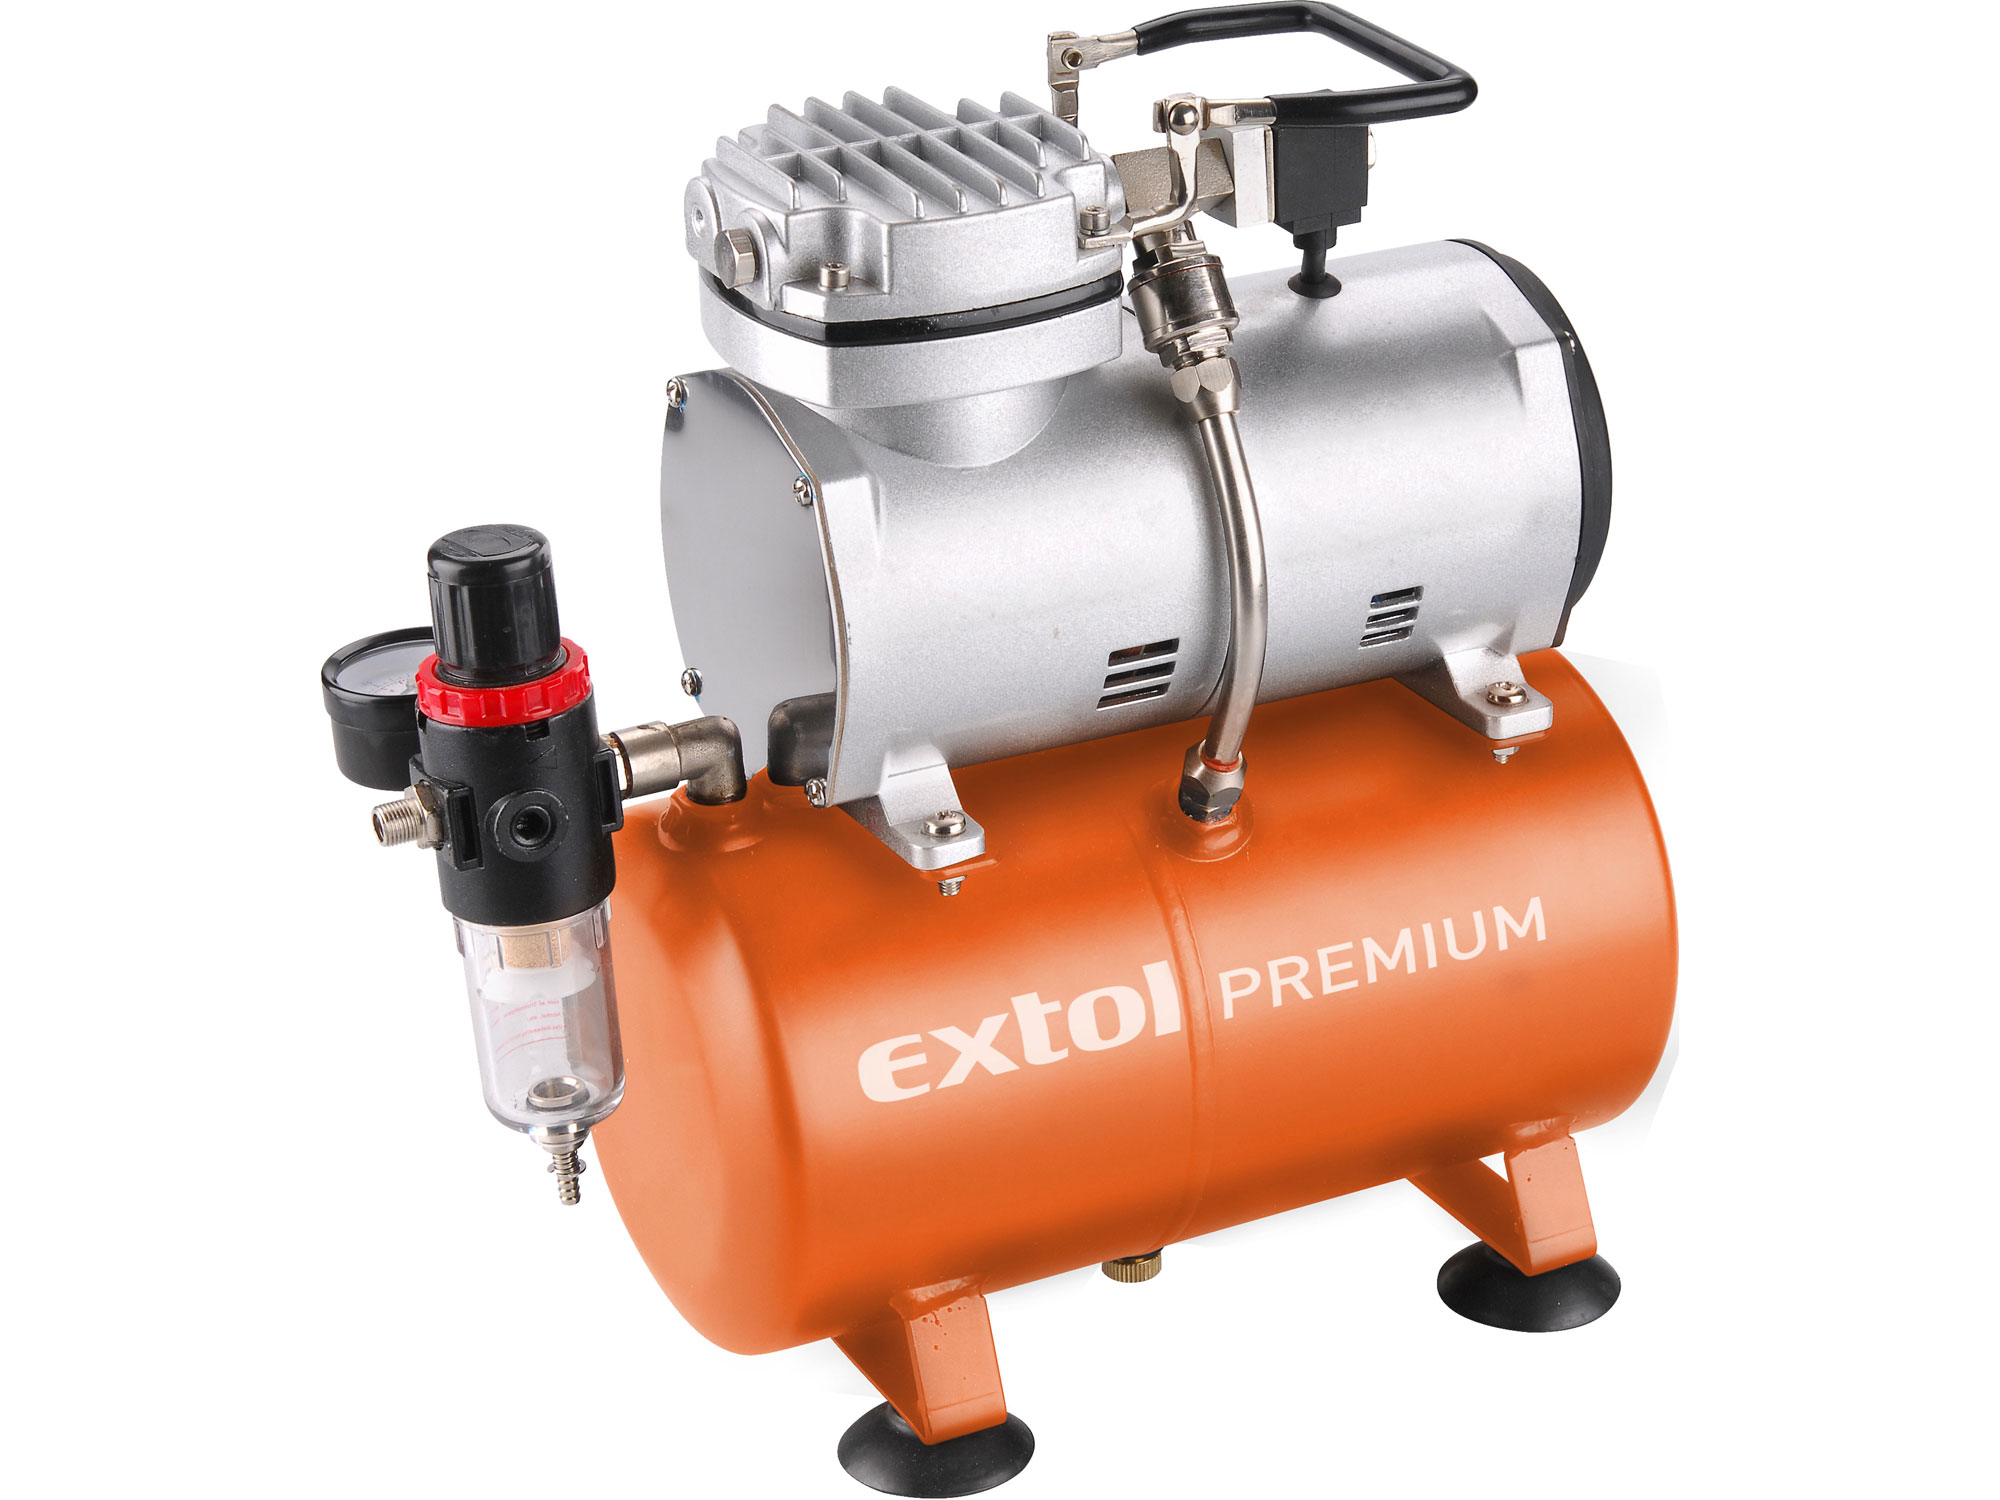 Kompresor, 150W AC-S3 EXTOL PREMIUM 8895300